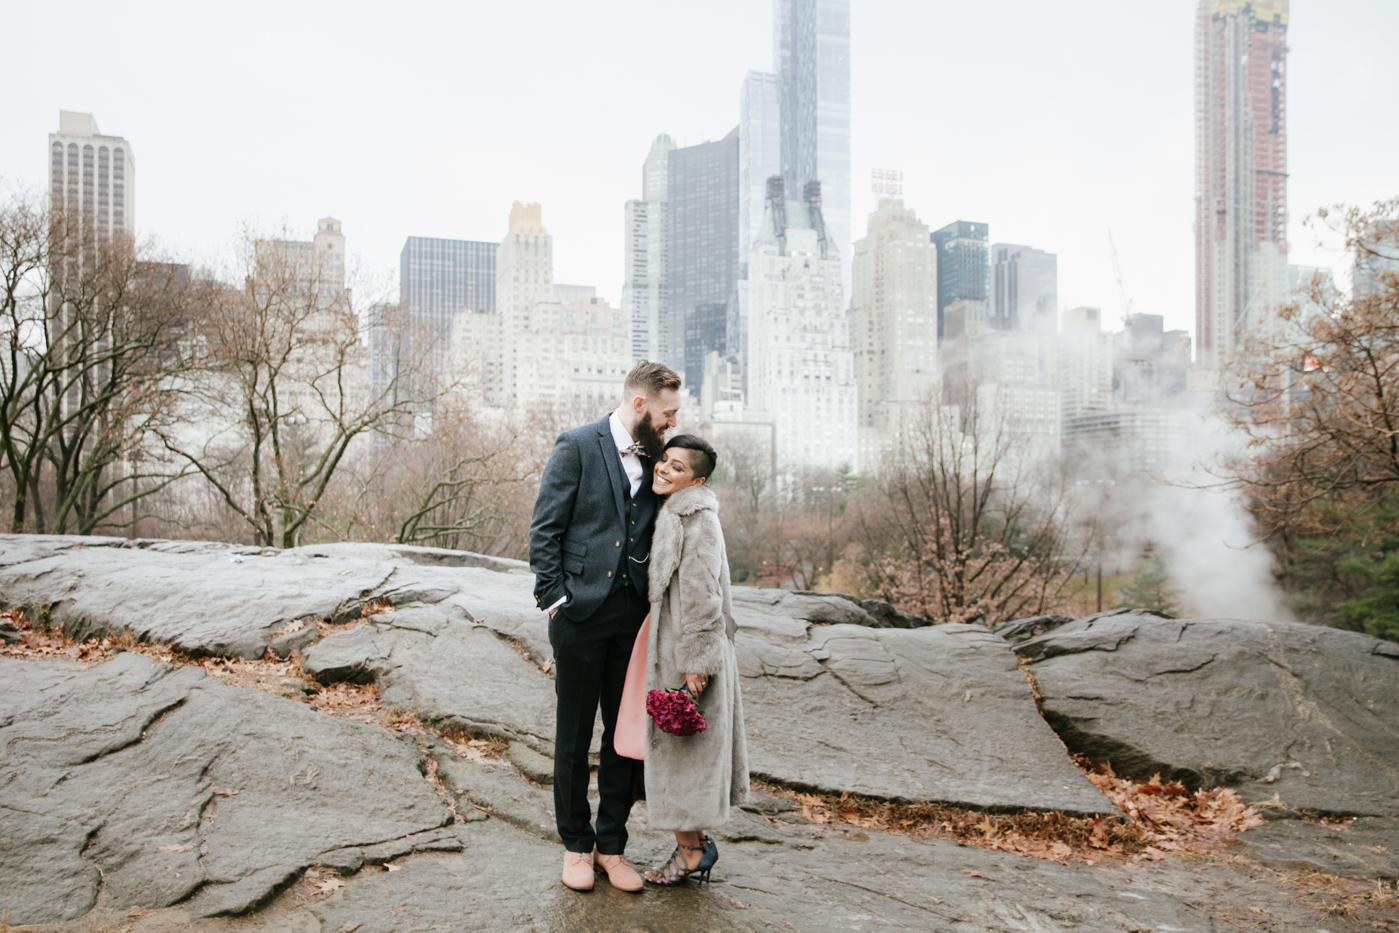 Central-park-wedding-by-Tanya-Isaeva-88.jpg